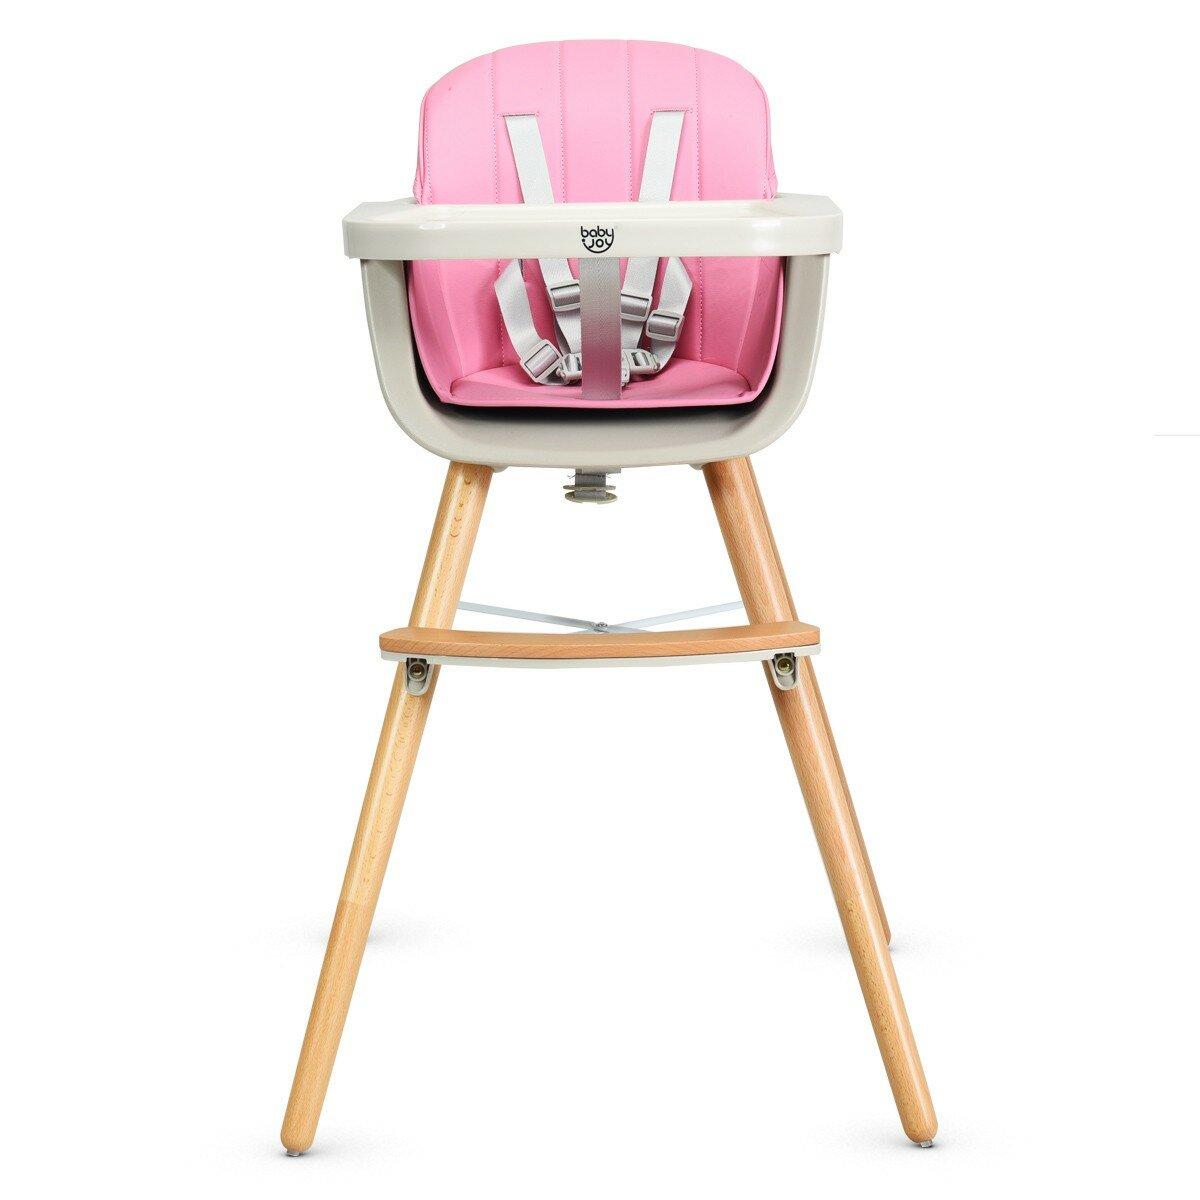 Sharp Baby High Chair